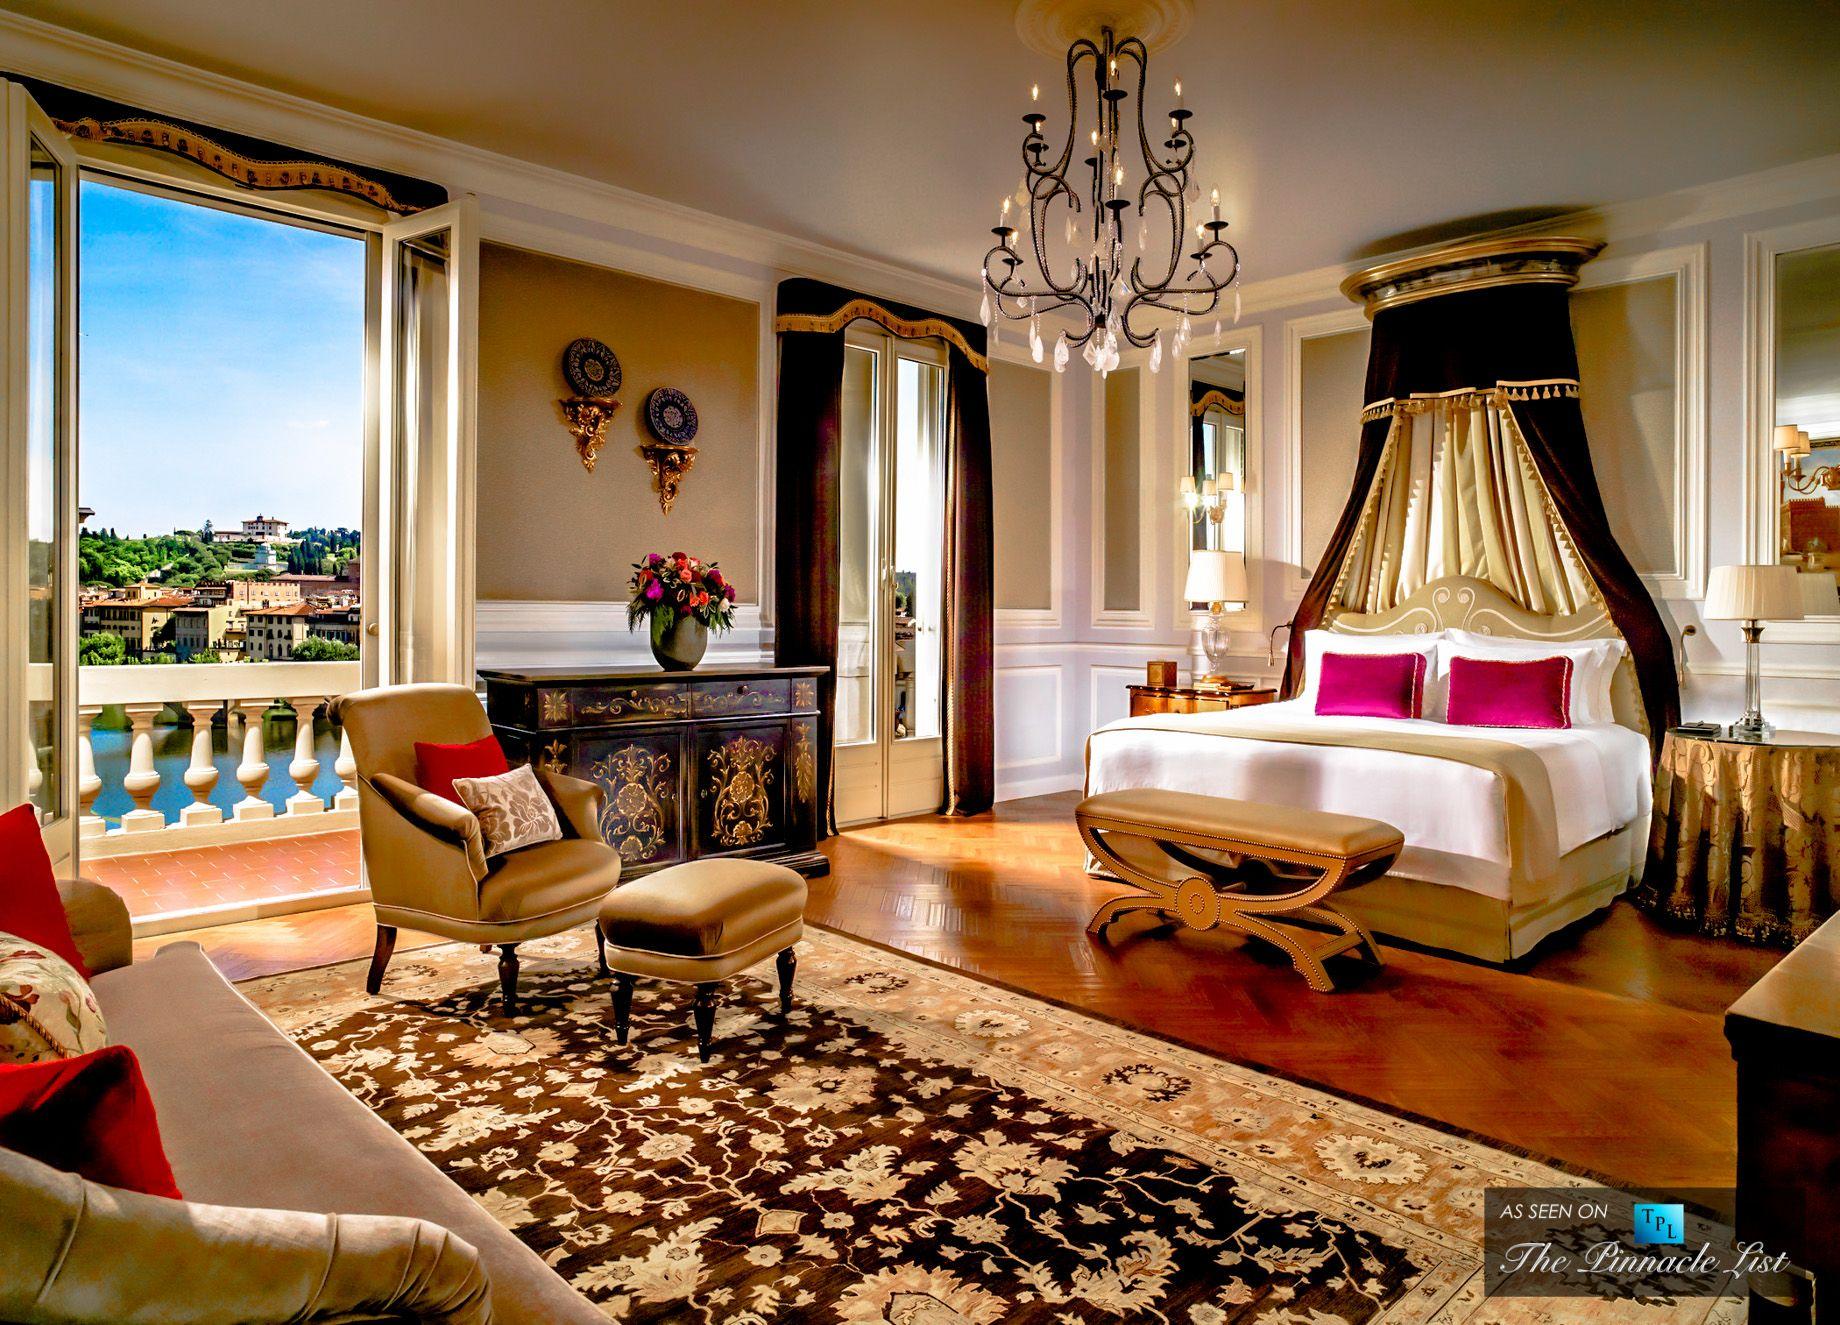 Adorable Master Bedroom Suite Of Luxury Suites | Luxury Bedrooms Celebrity Pictures